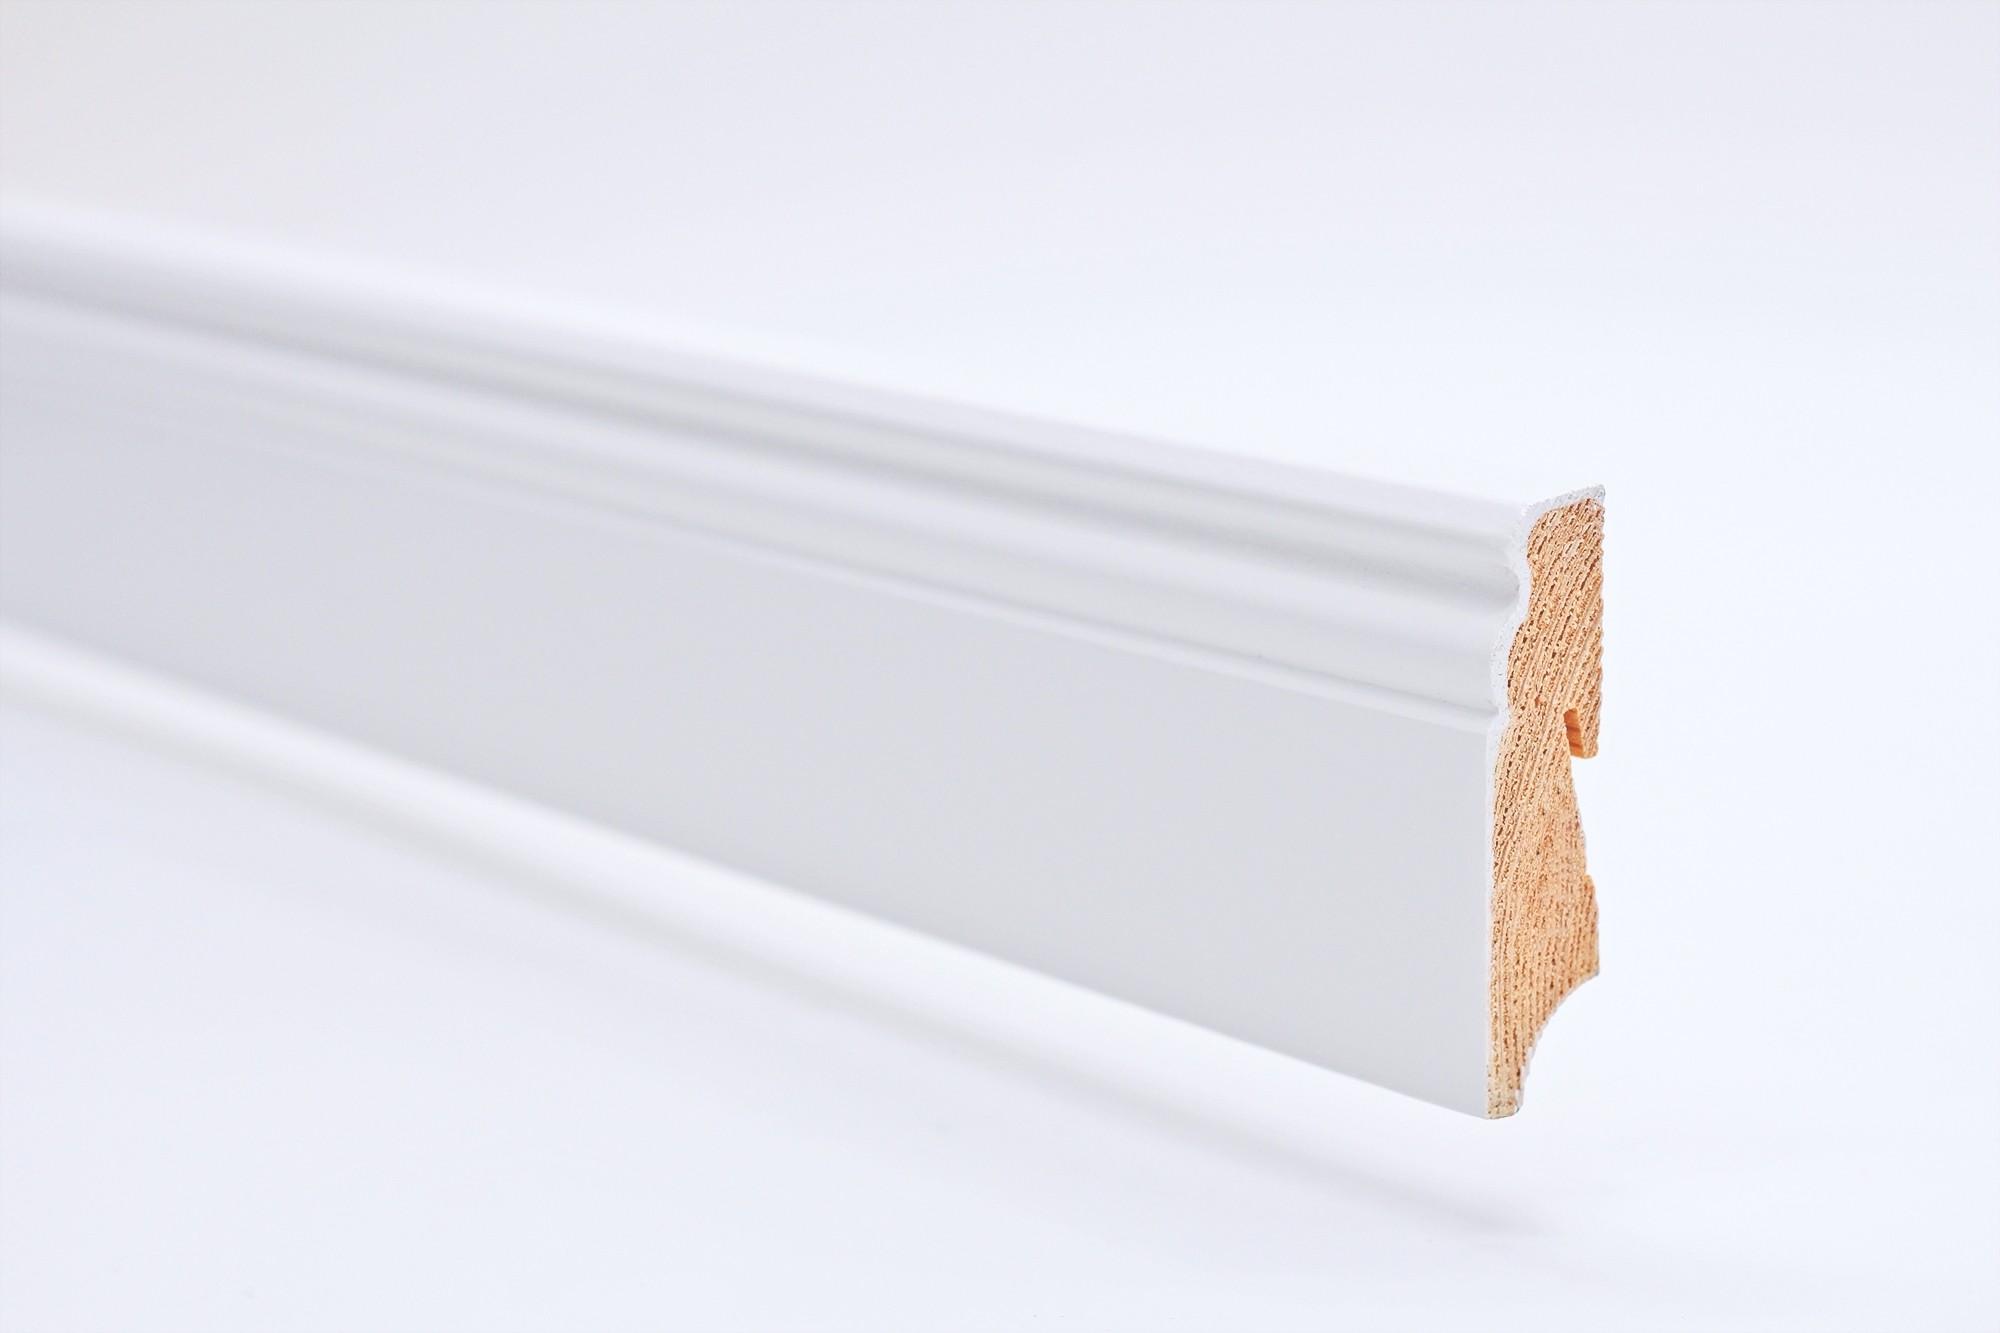 Sockelleiste (2400 x 18 x 70) Altdeutsch weiß lackiert Massivholz - Interio